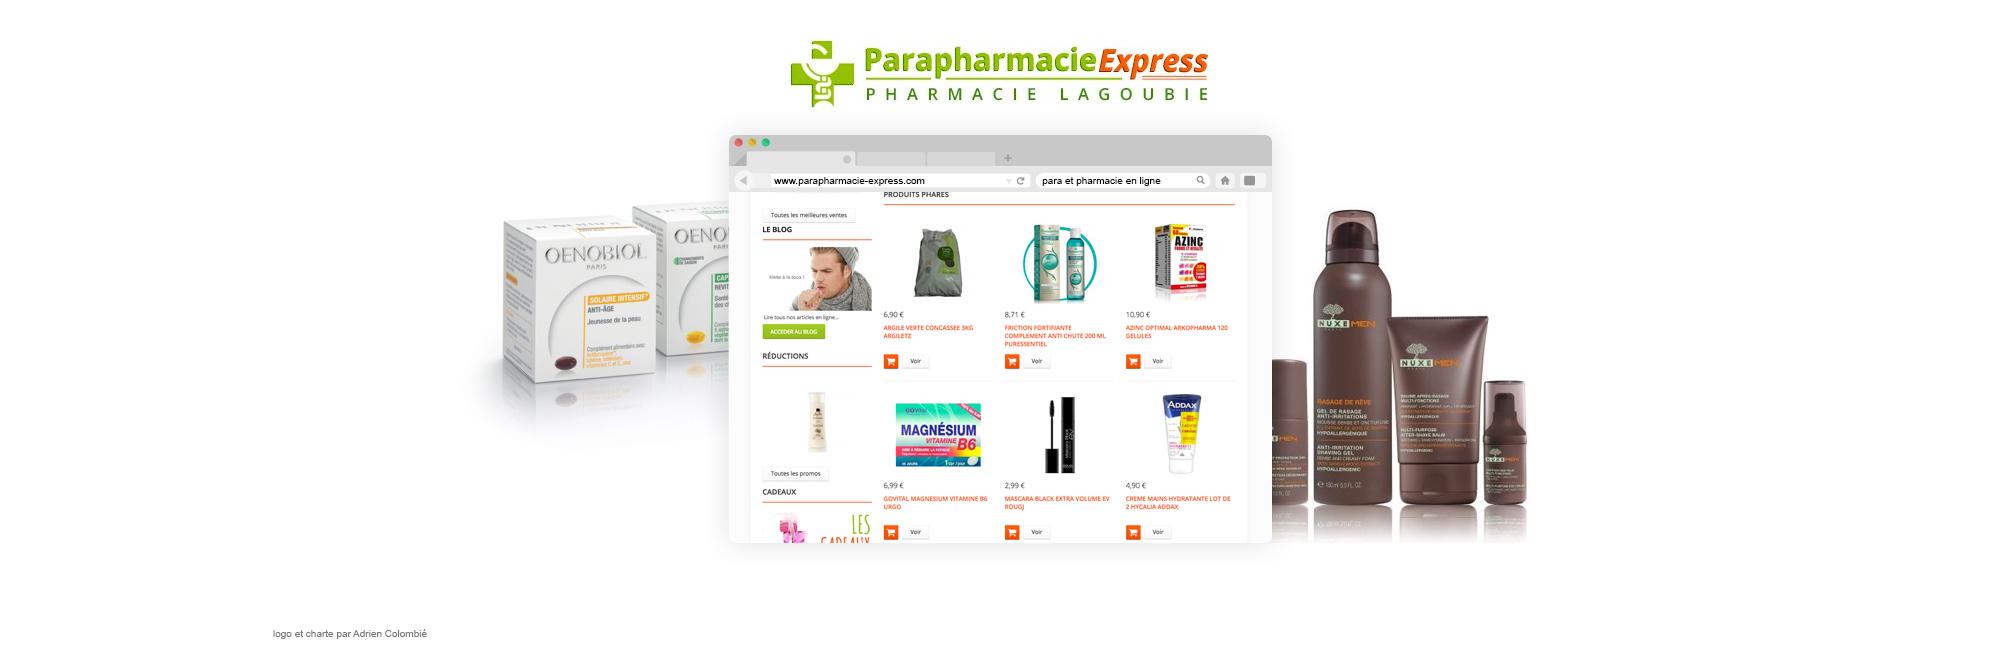 slide-parapharmacie-express